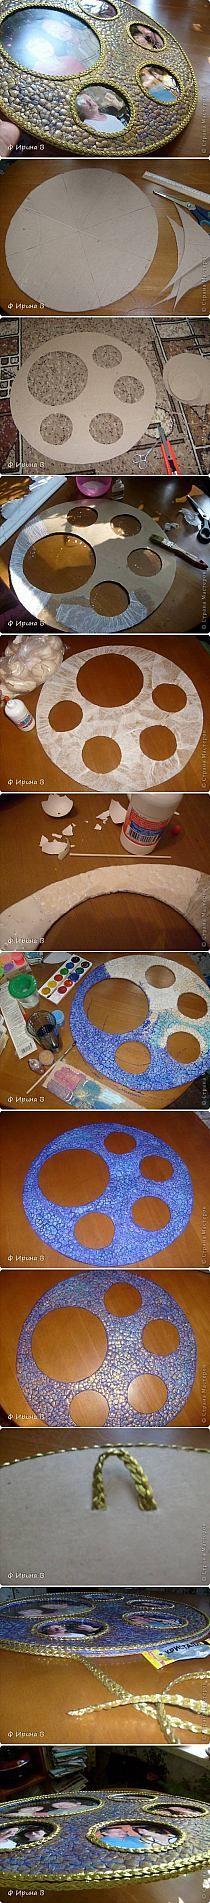 DIY Eggshell Panorama Frame DIY Projects | UsefulDIY.co…